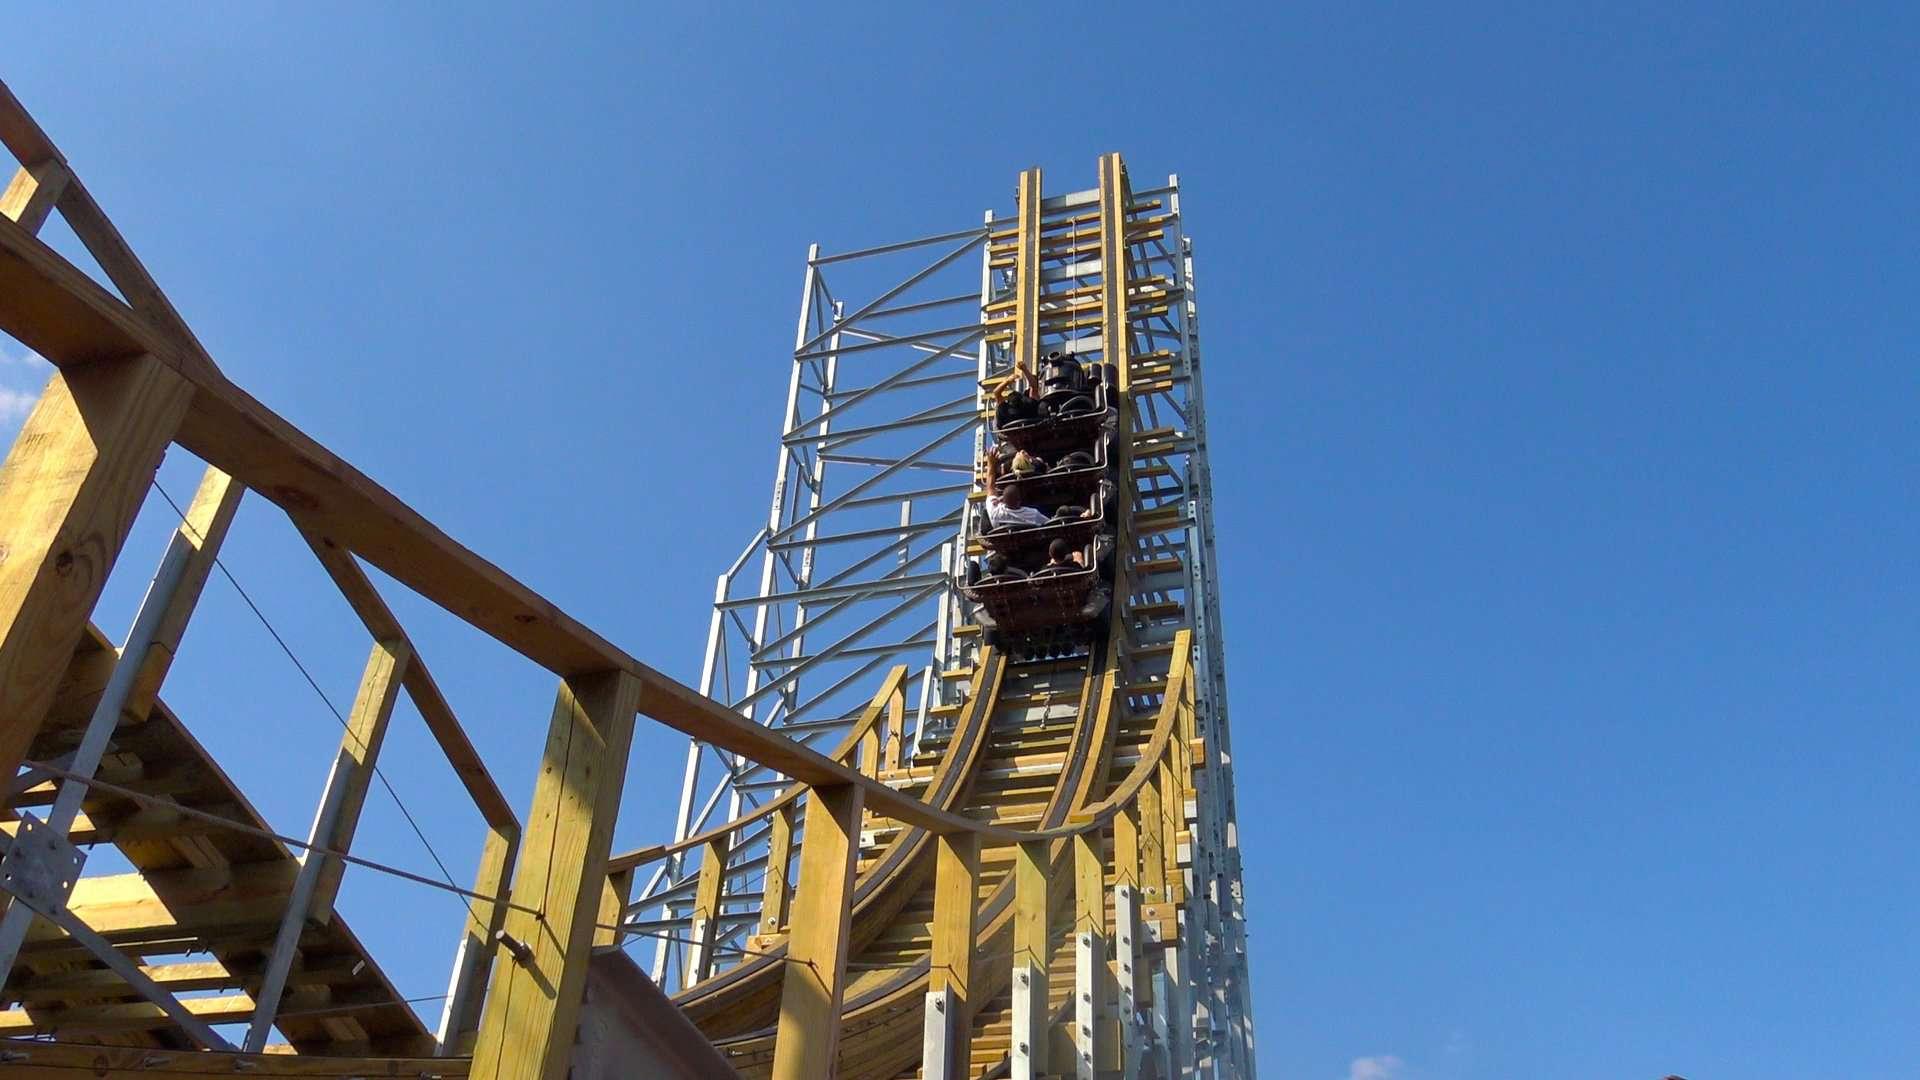 Switchback coaster at ZDT's Amusement Park